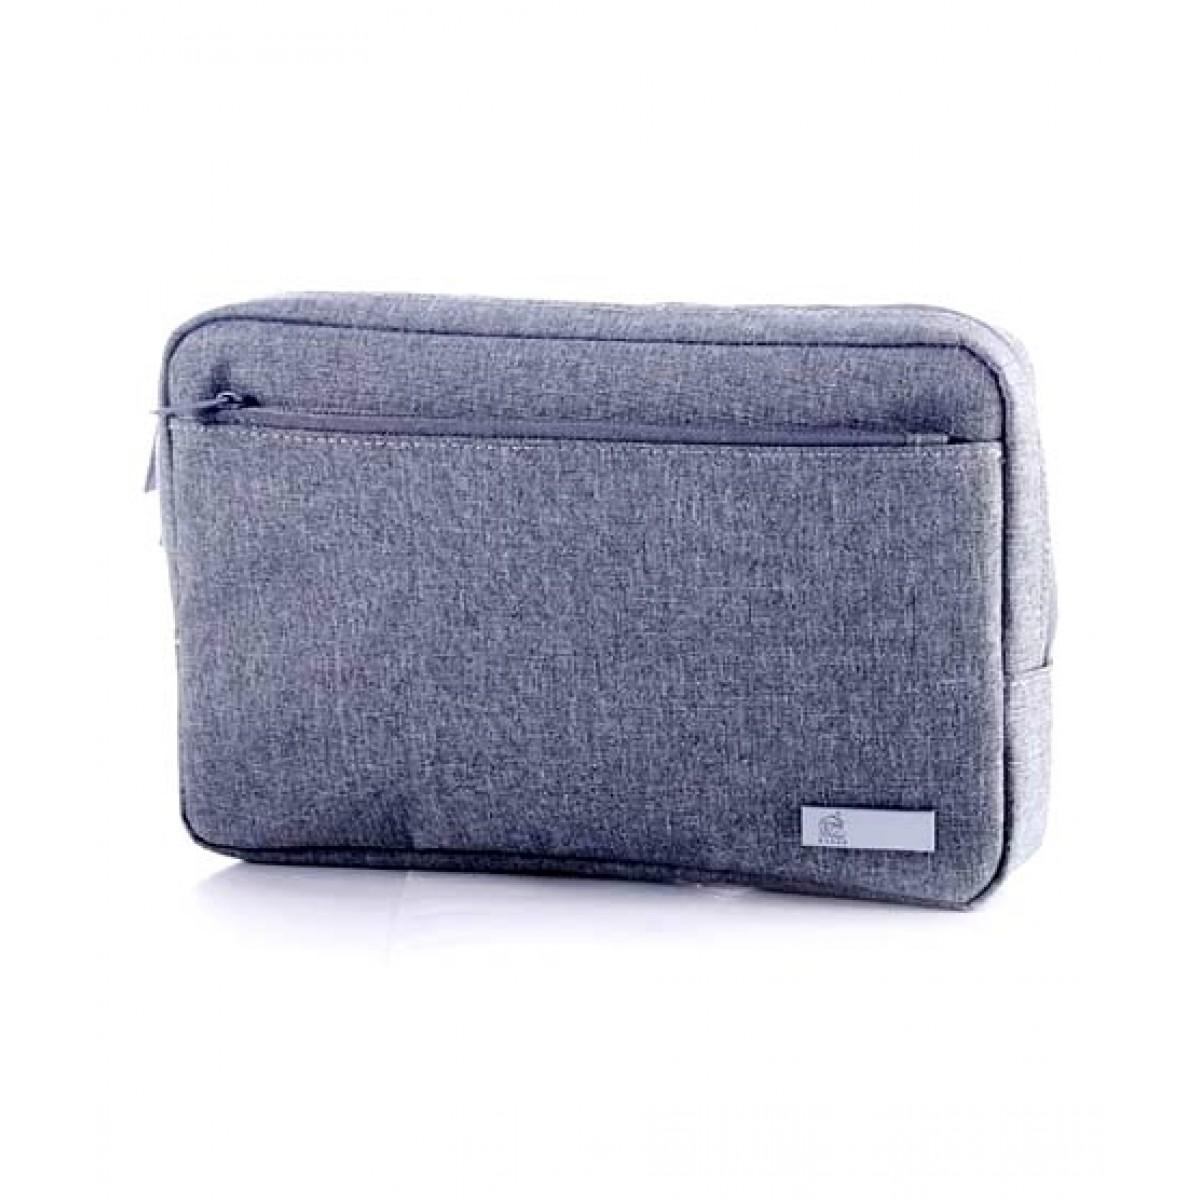 G-Mart Travel Storage Bag Grey (70957)